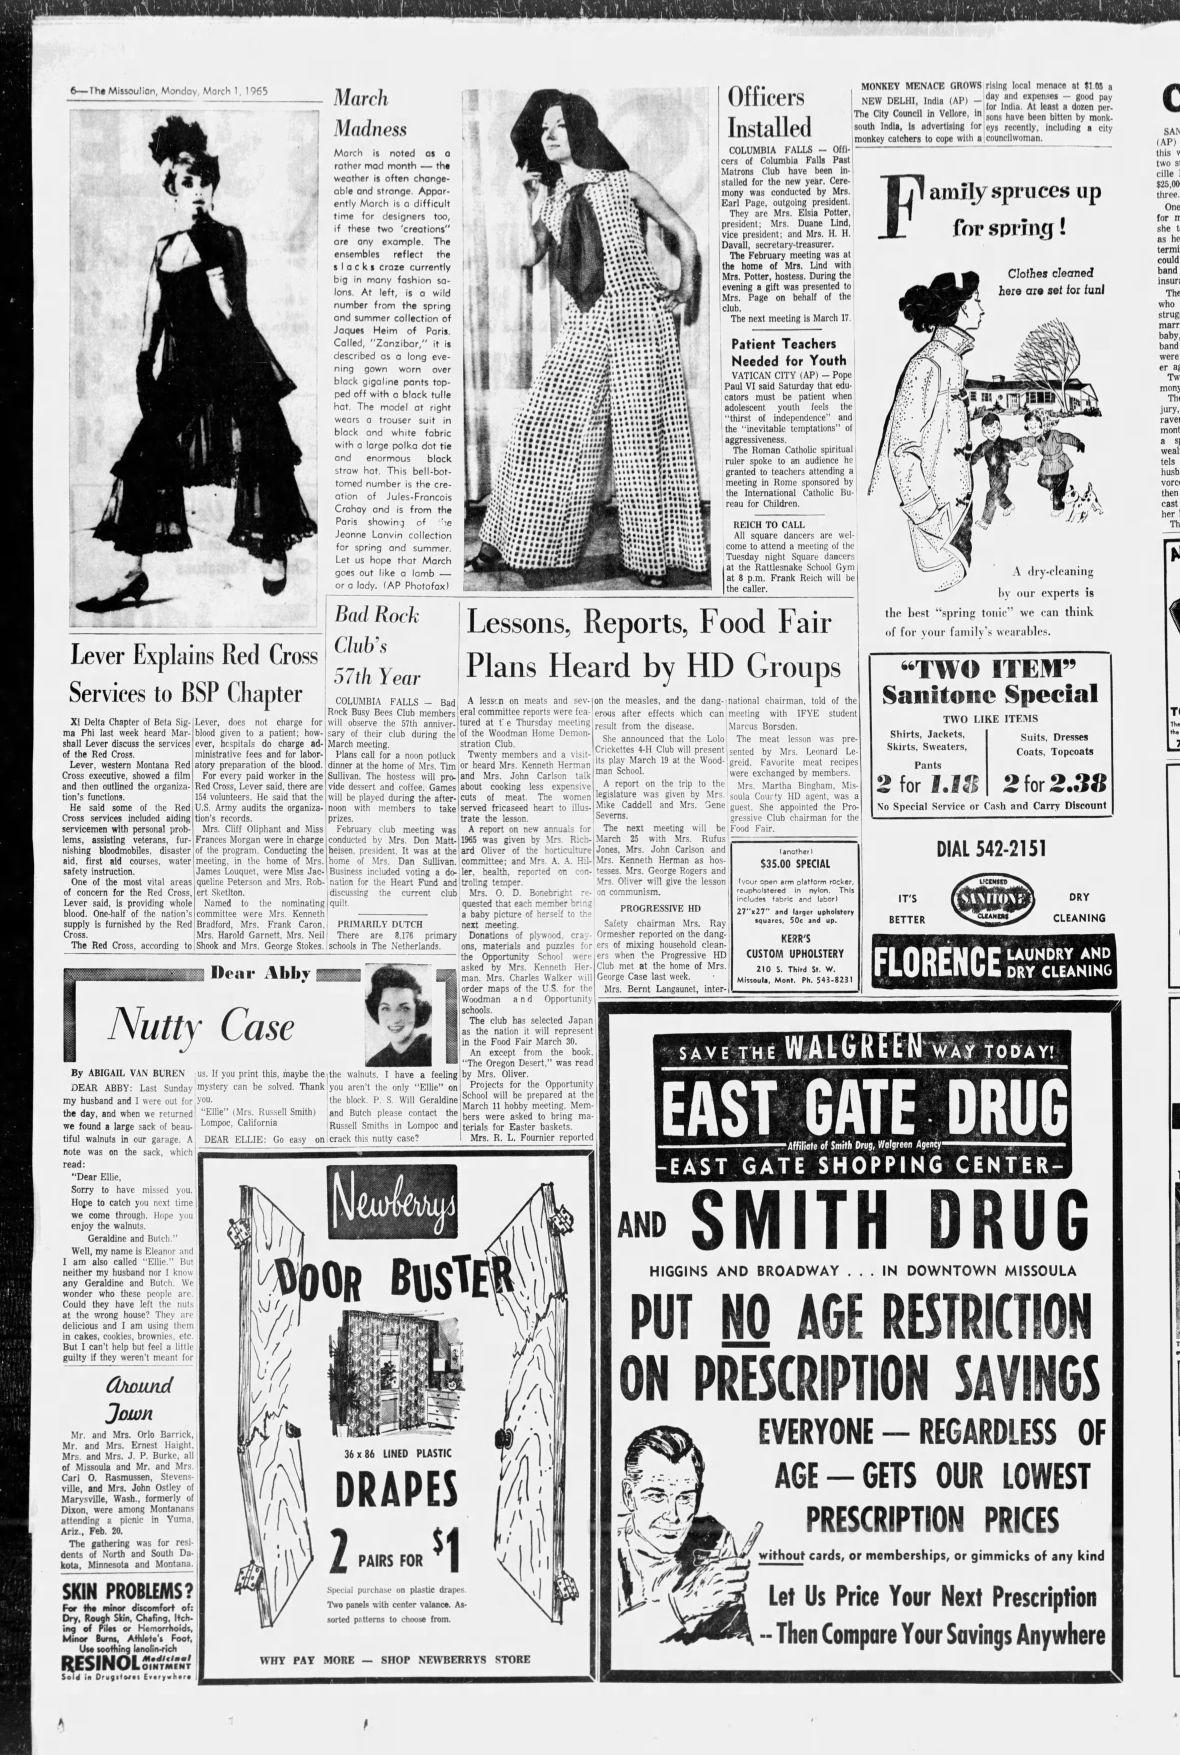 March Madness fashion 1965